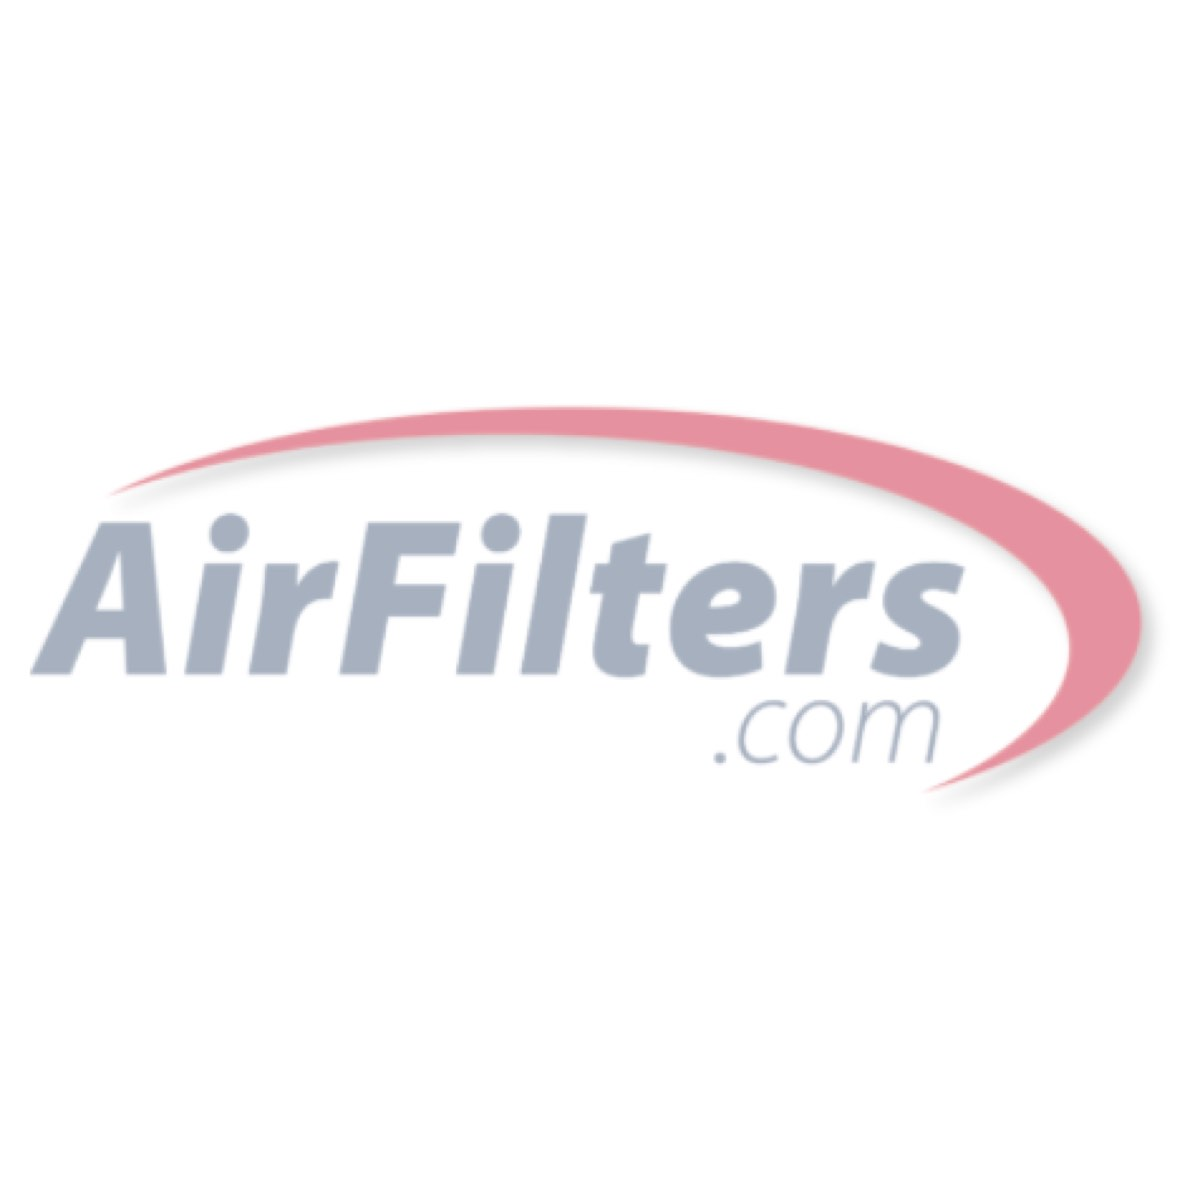 Accumulair Diamond MERV 13 Filters - 1/2 Inch